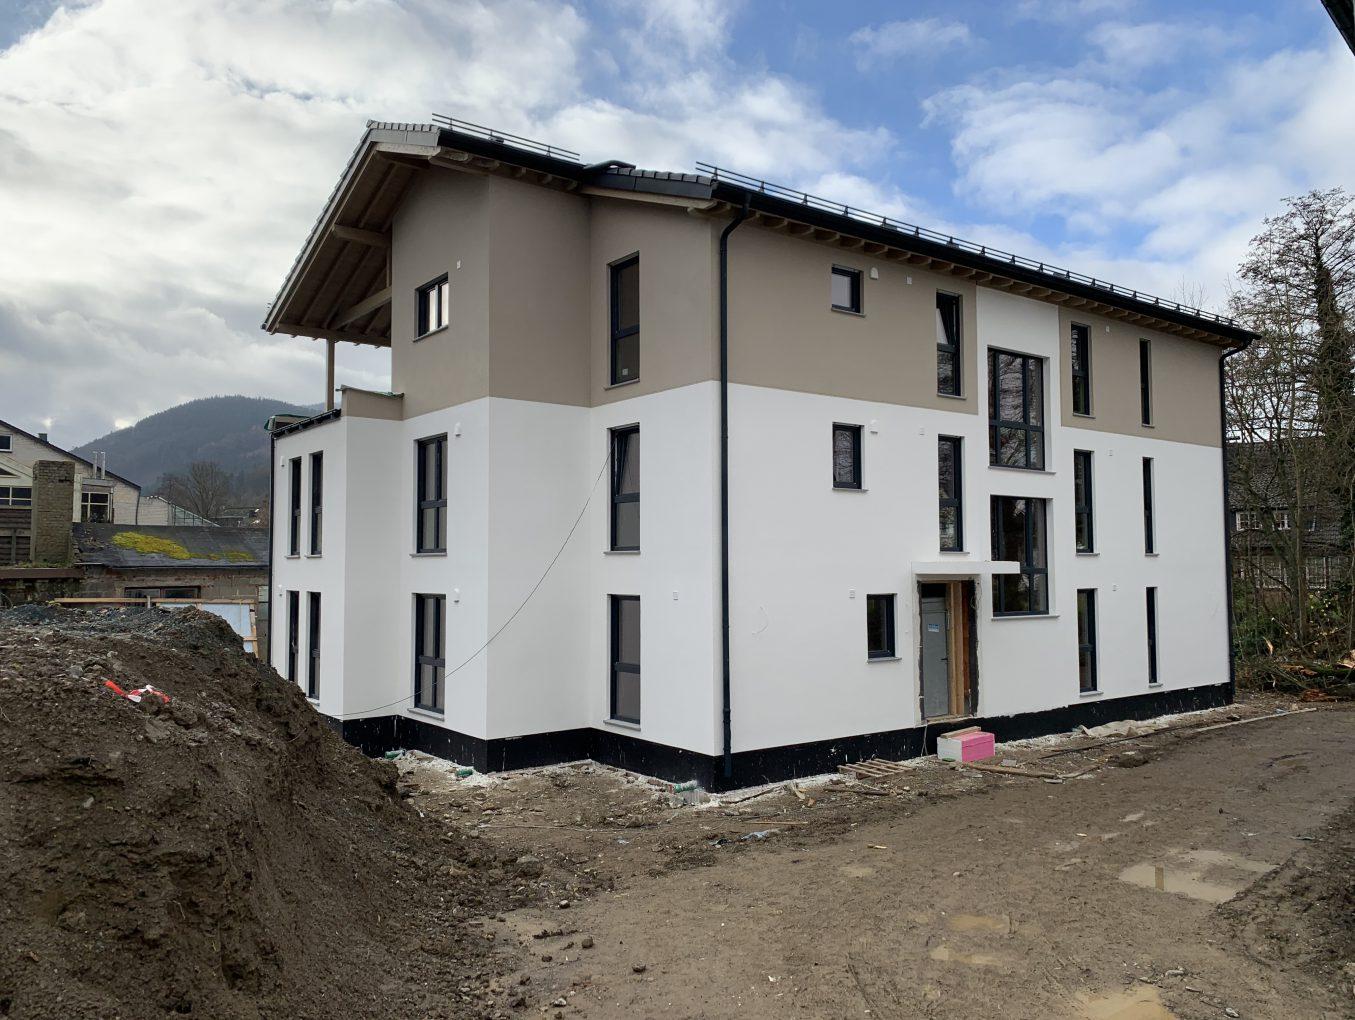 Tag der offenen Baustelle -Mehrfamilienhäuser in Holzrahmenbauweise